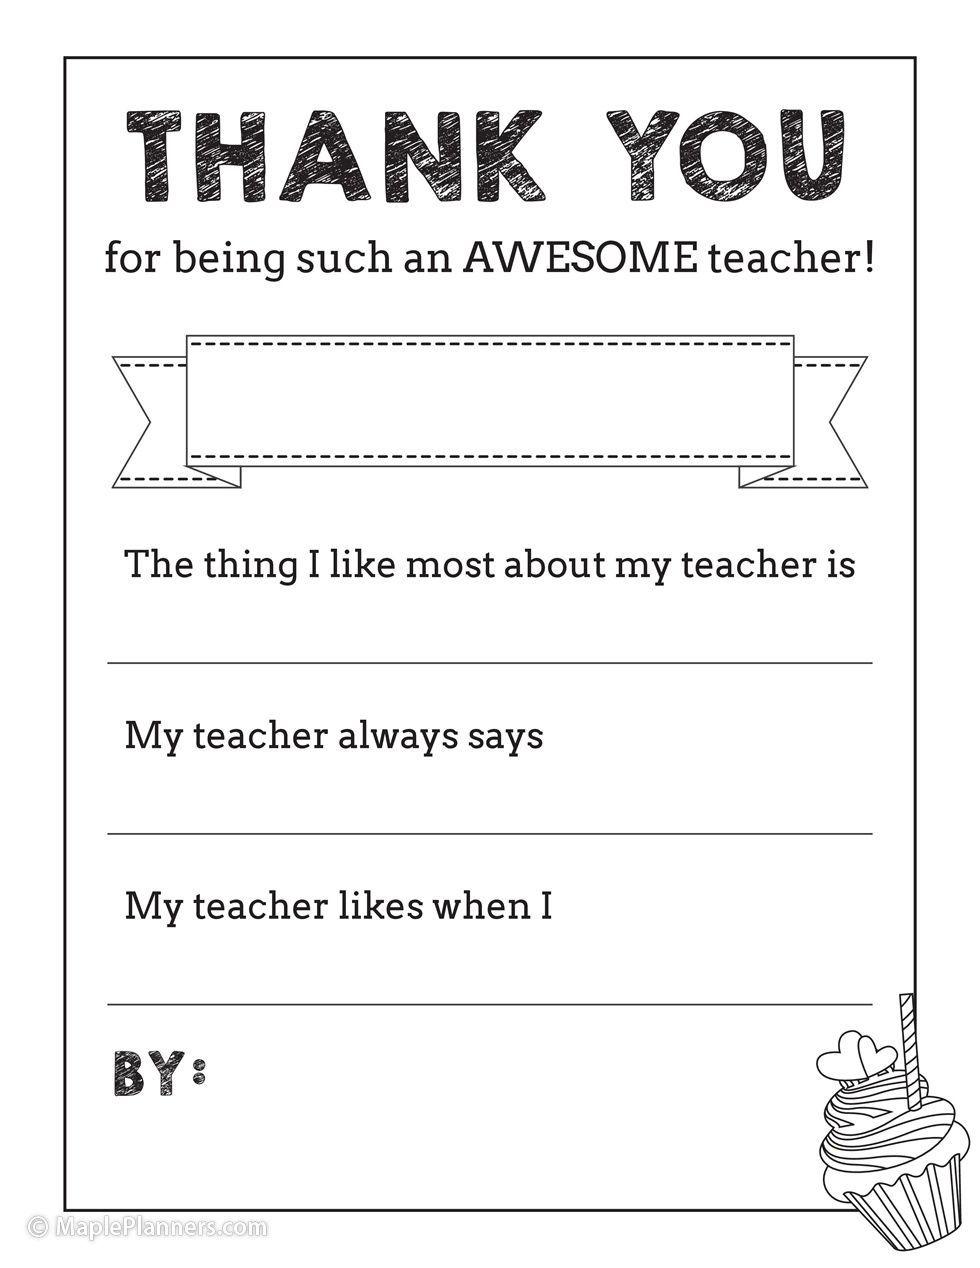 Free Printable Teacher Appreciation Thank You Notes Teacher Appreciation Printables Teacher Appreciation Quotes Printables Free Teacher Appreciation Printables